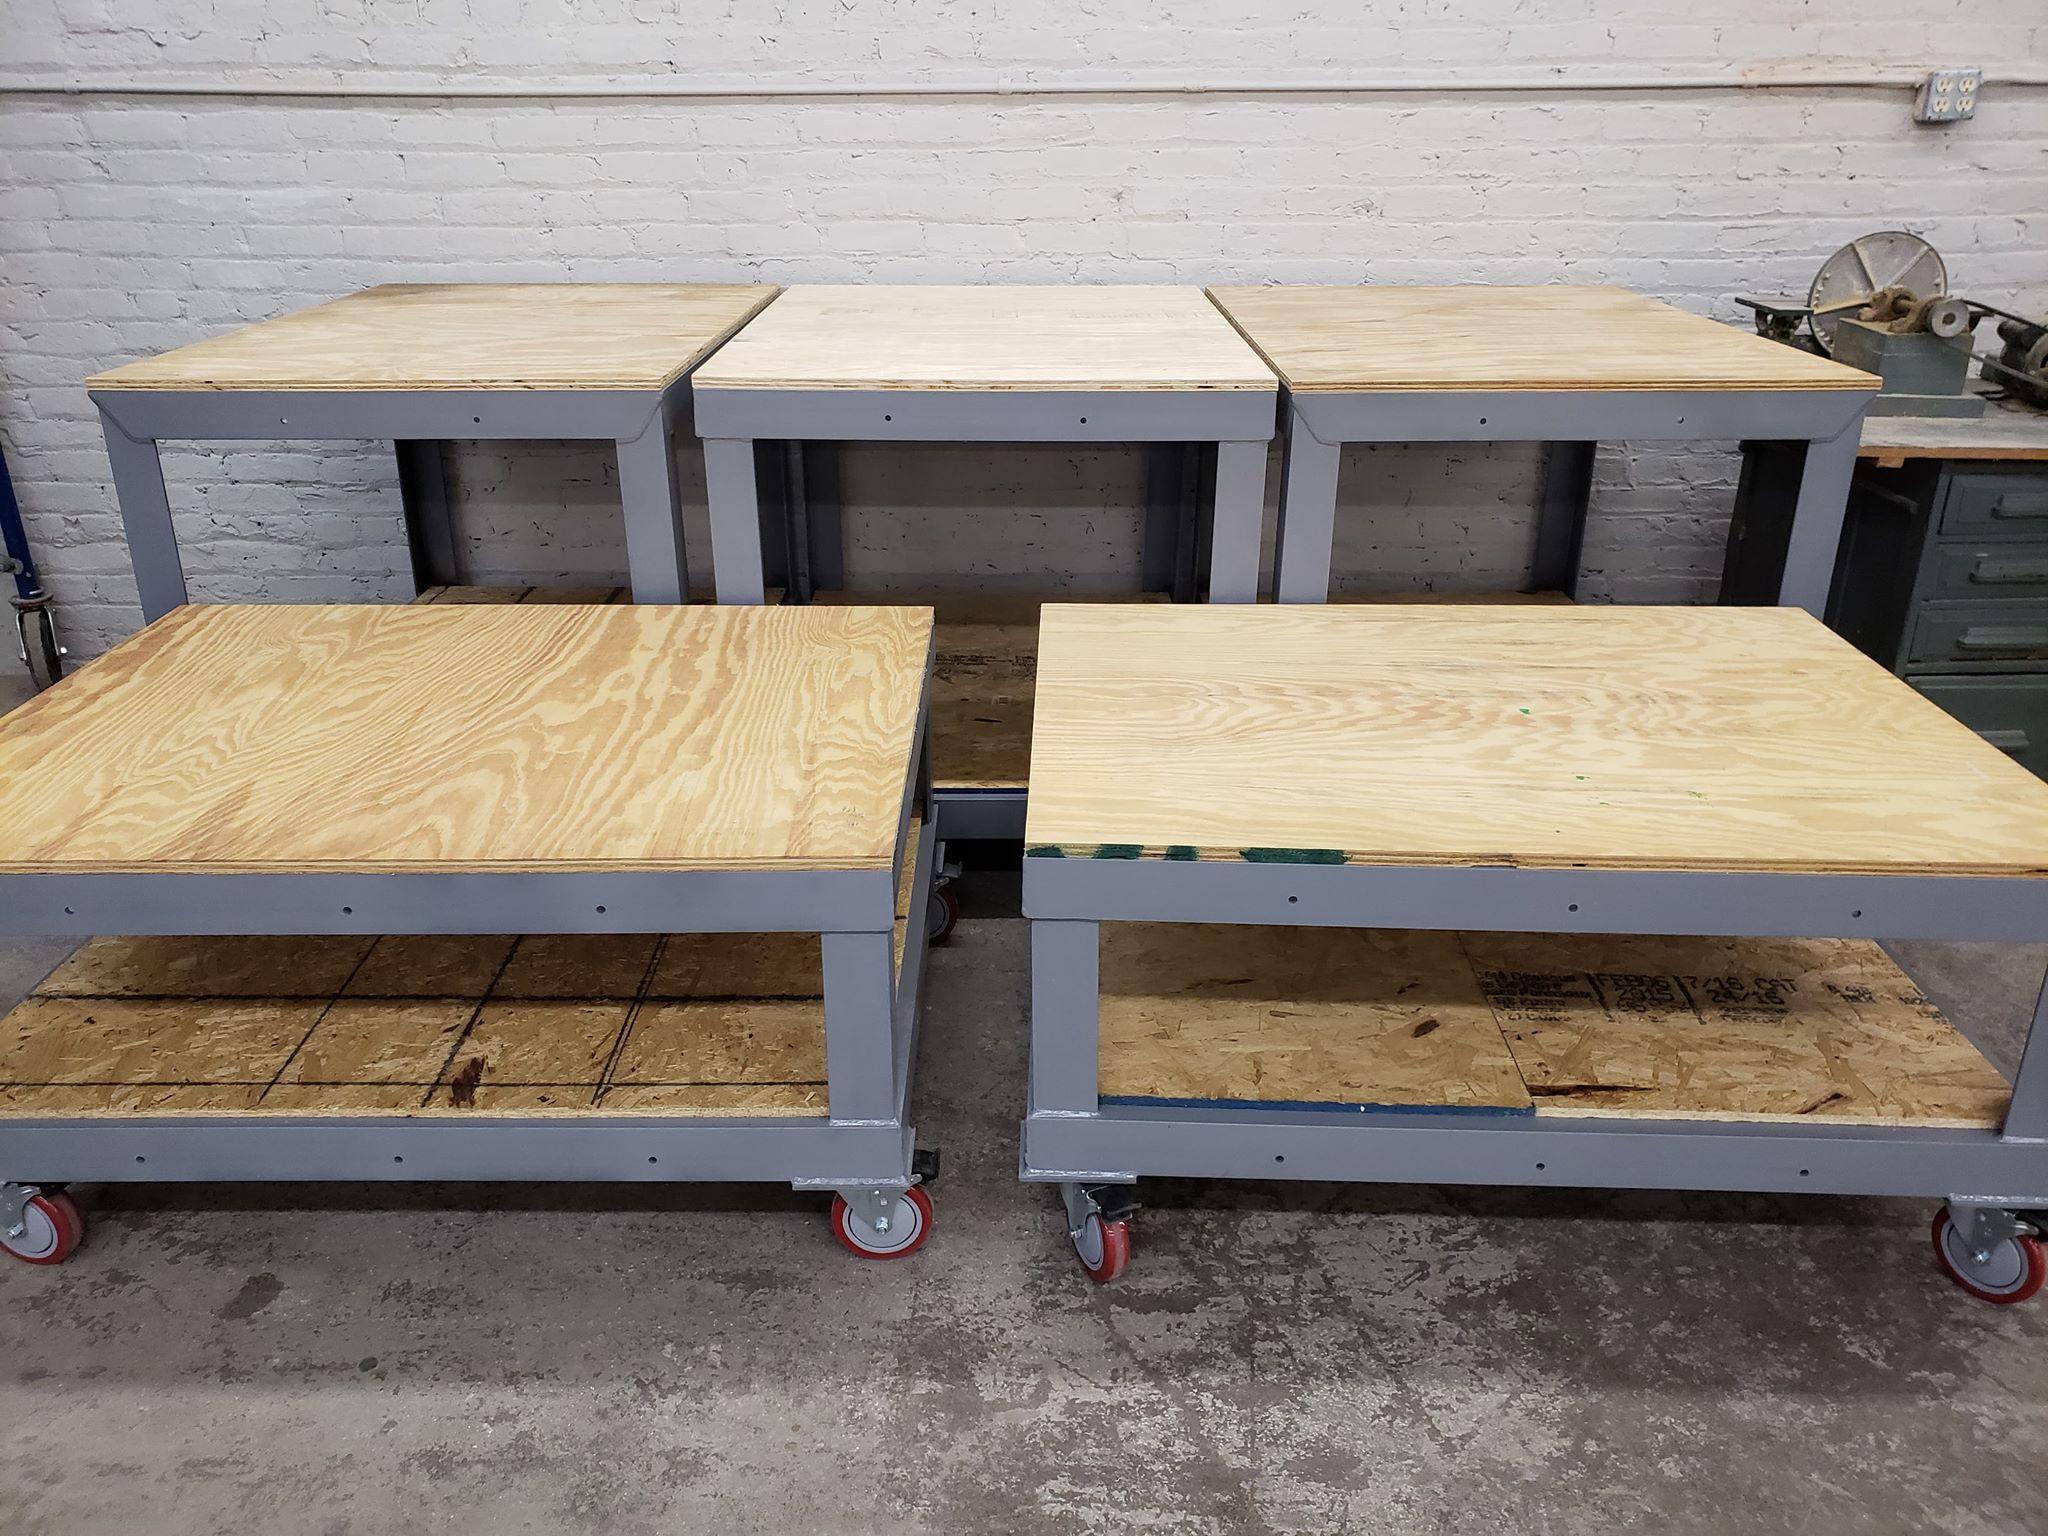 hobart interns fabricate specially designed tables | habitat